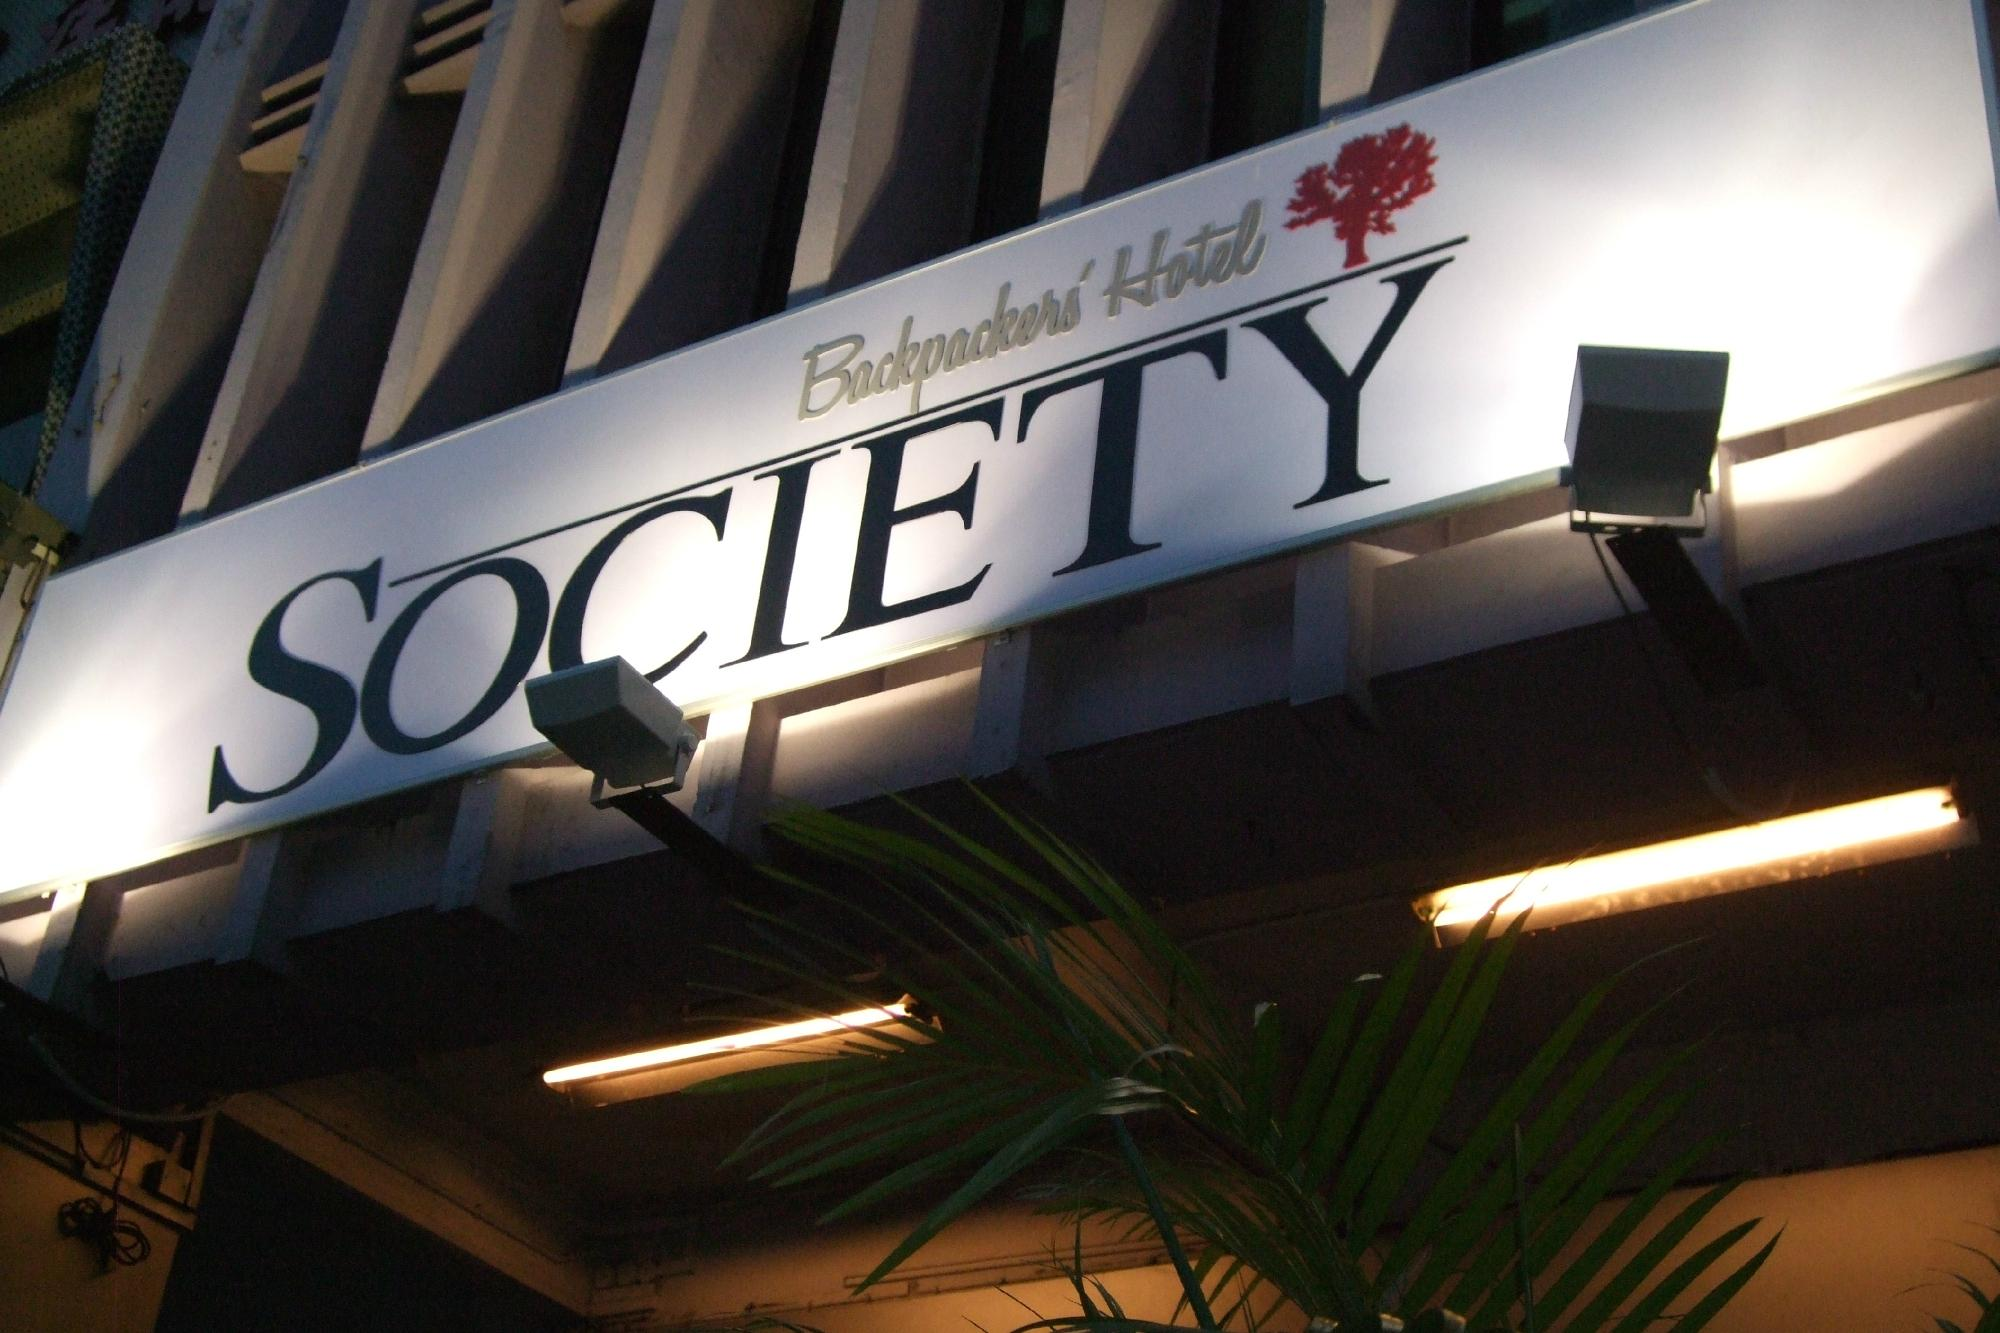 Society Backpackers' Hotel